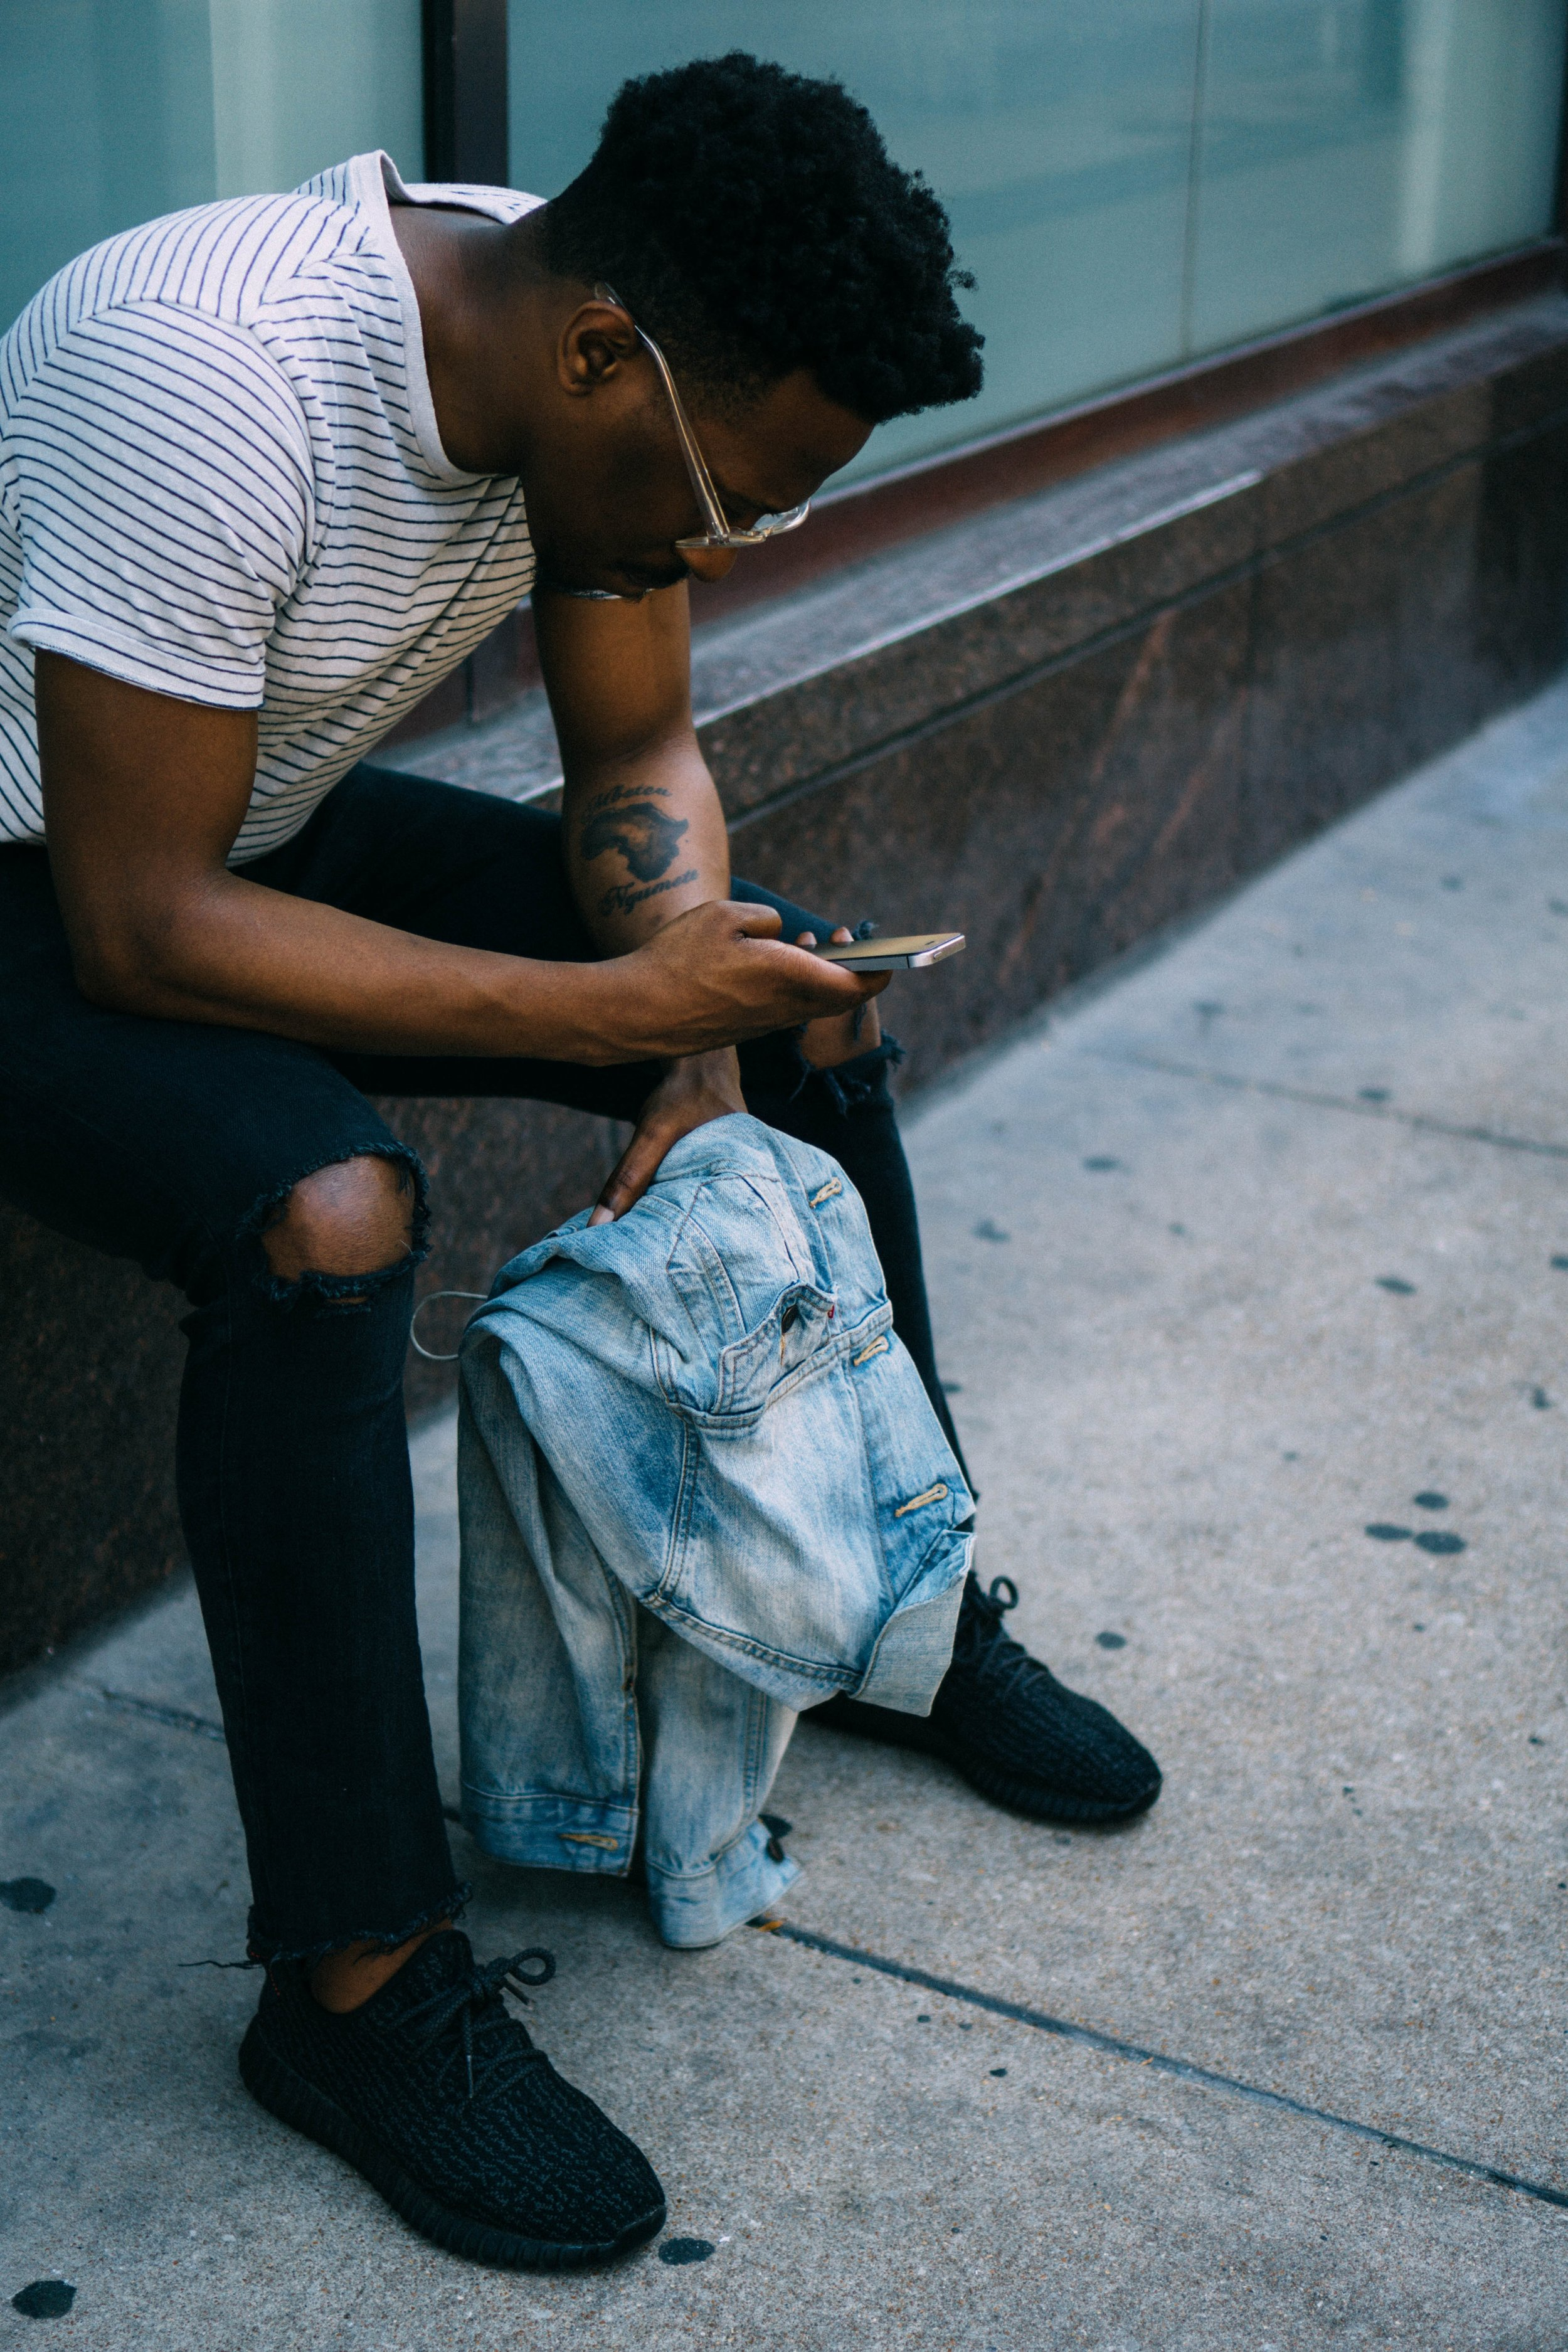 Man-with-phone.jpg